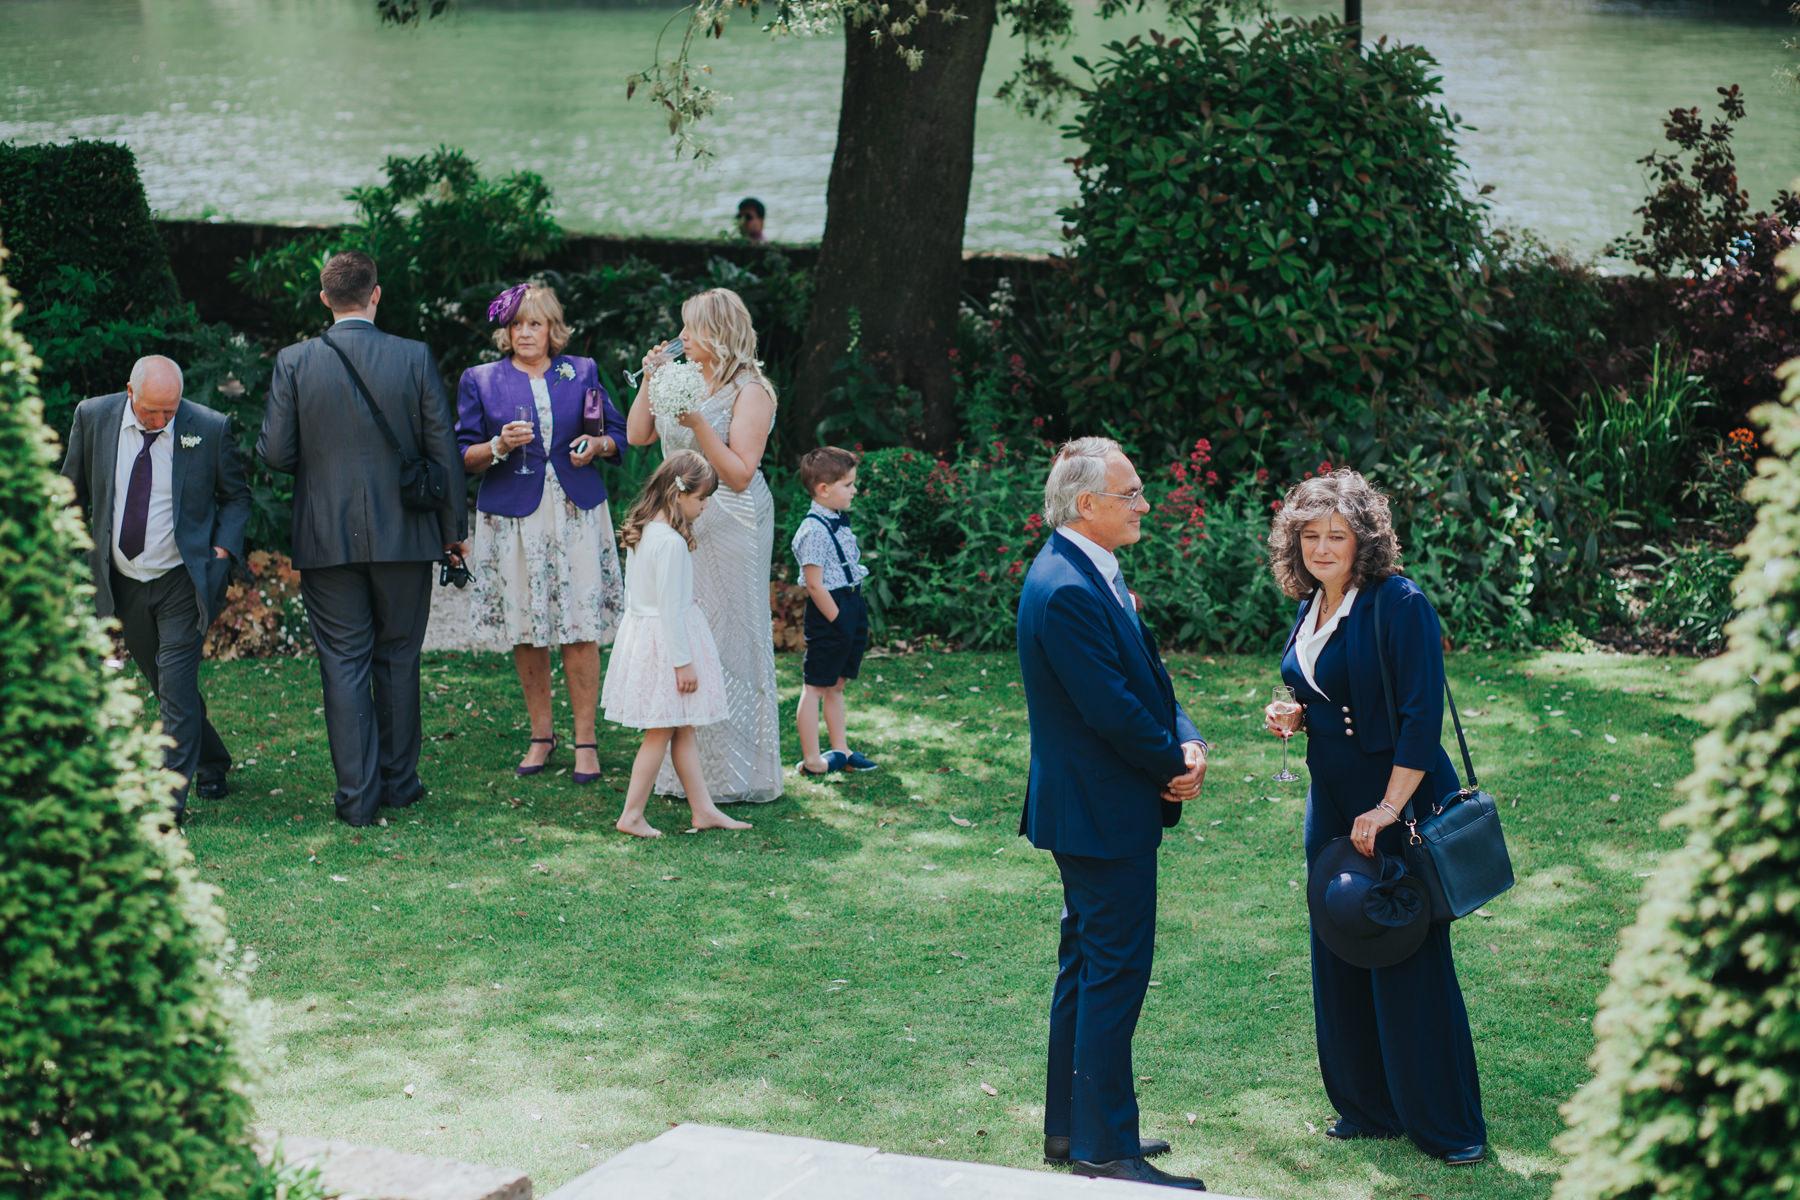 CRL-280-The Bingham wedding Richmond-reportage guest candid photographer.jpg